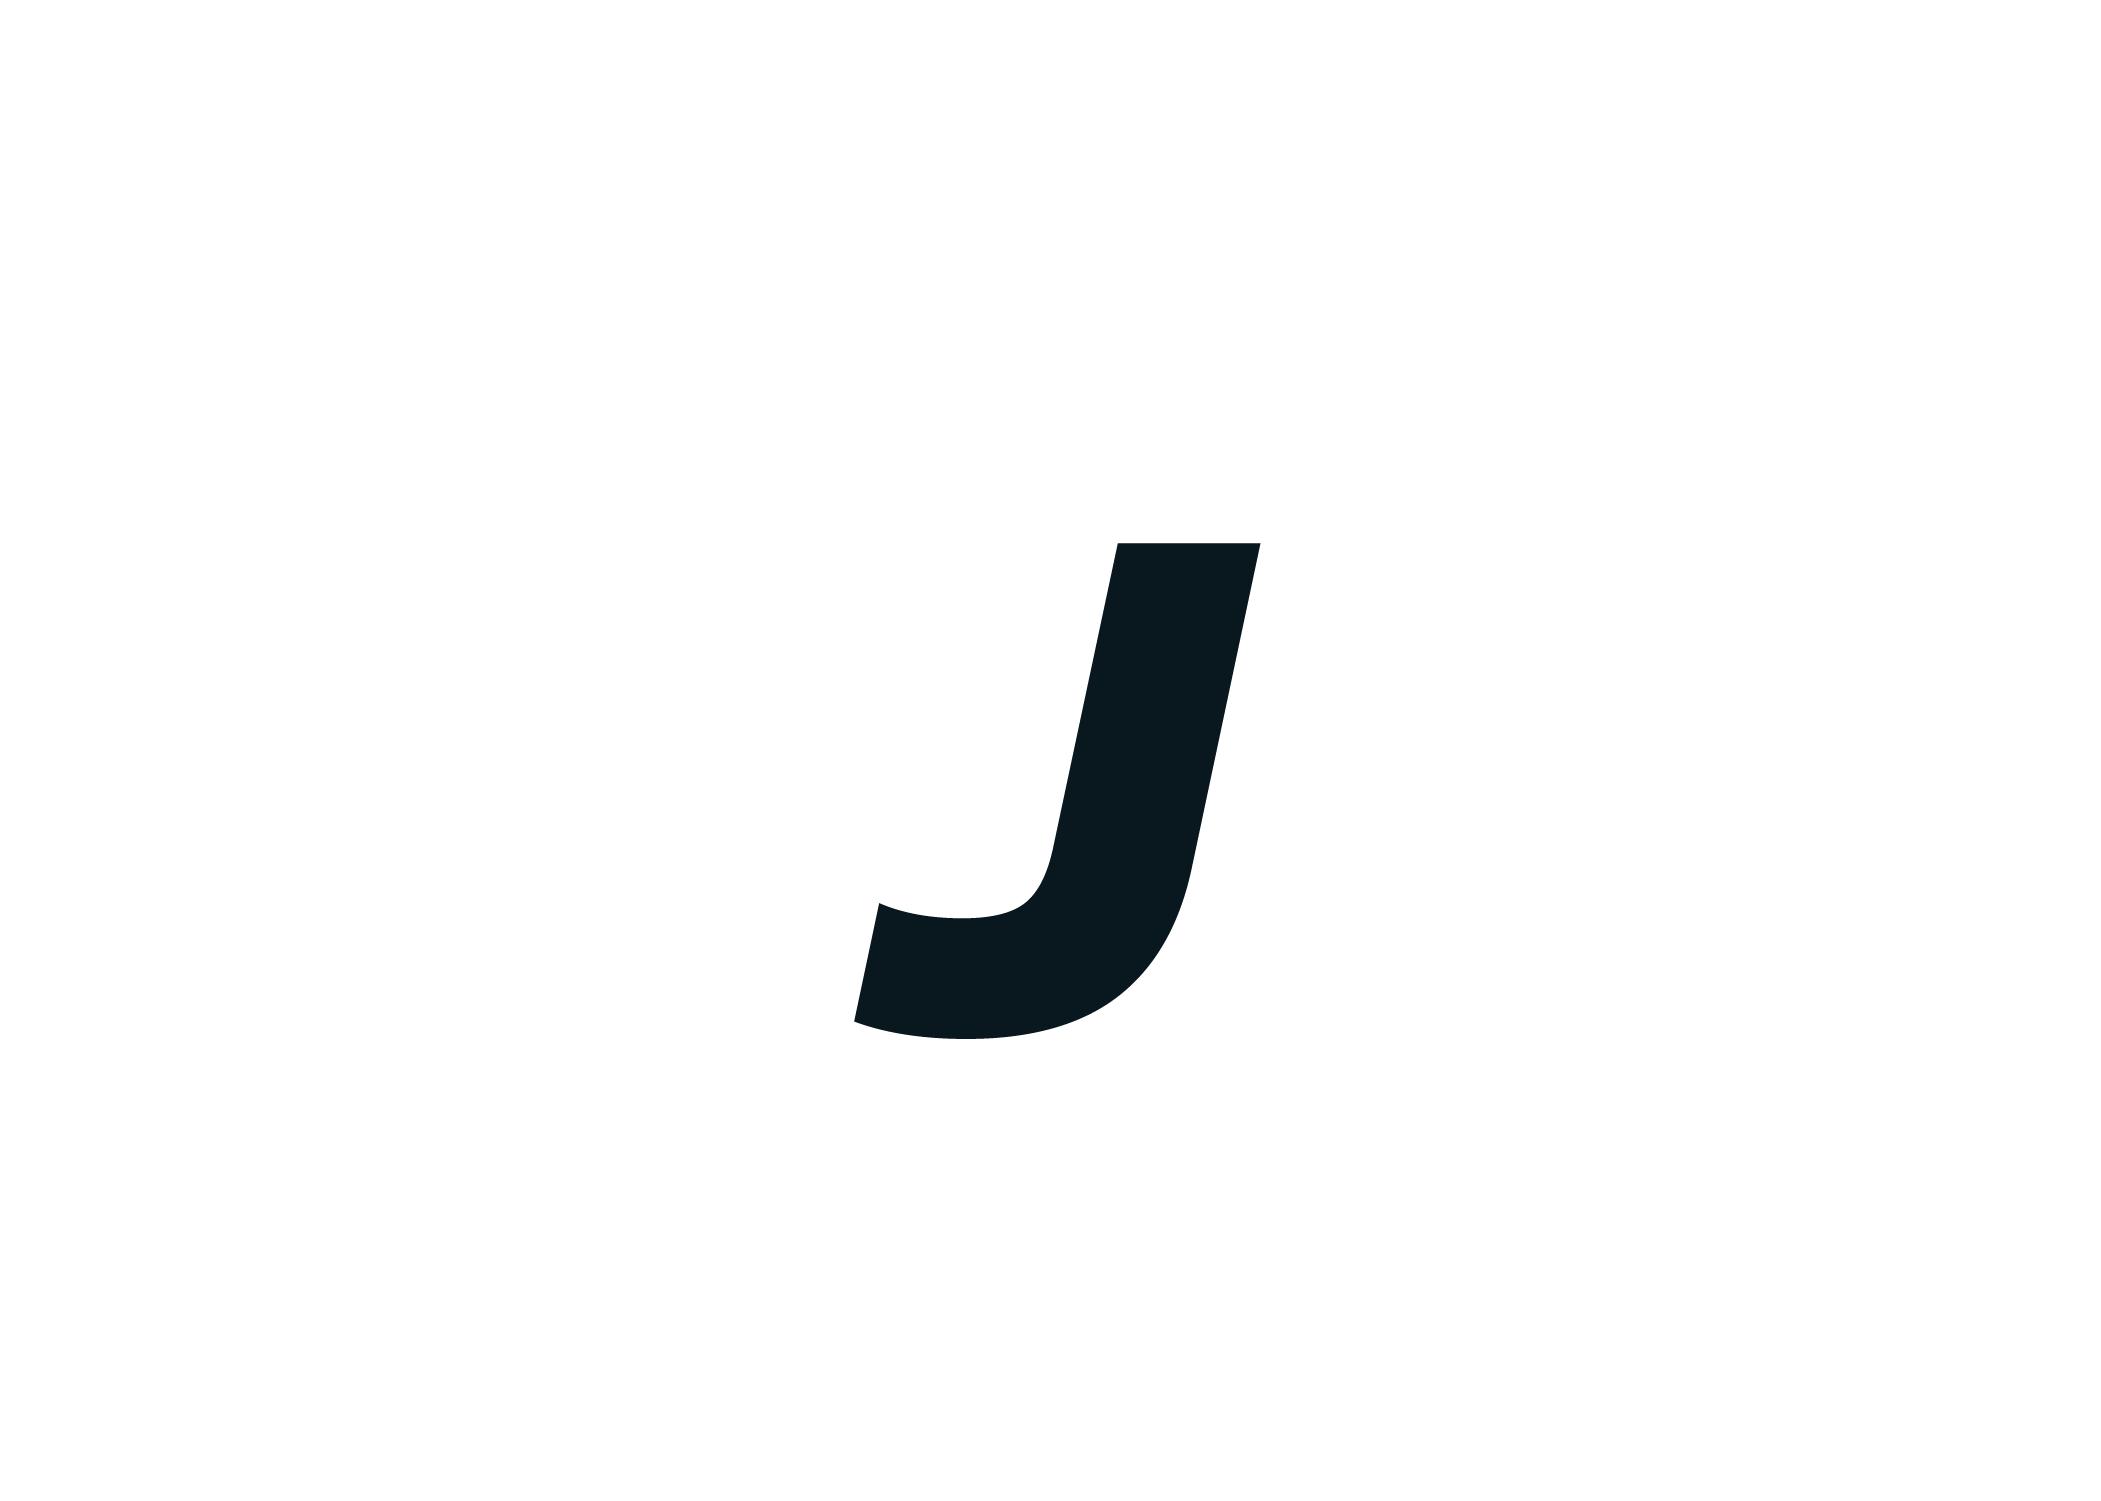 John Jackson Visual Design